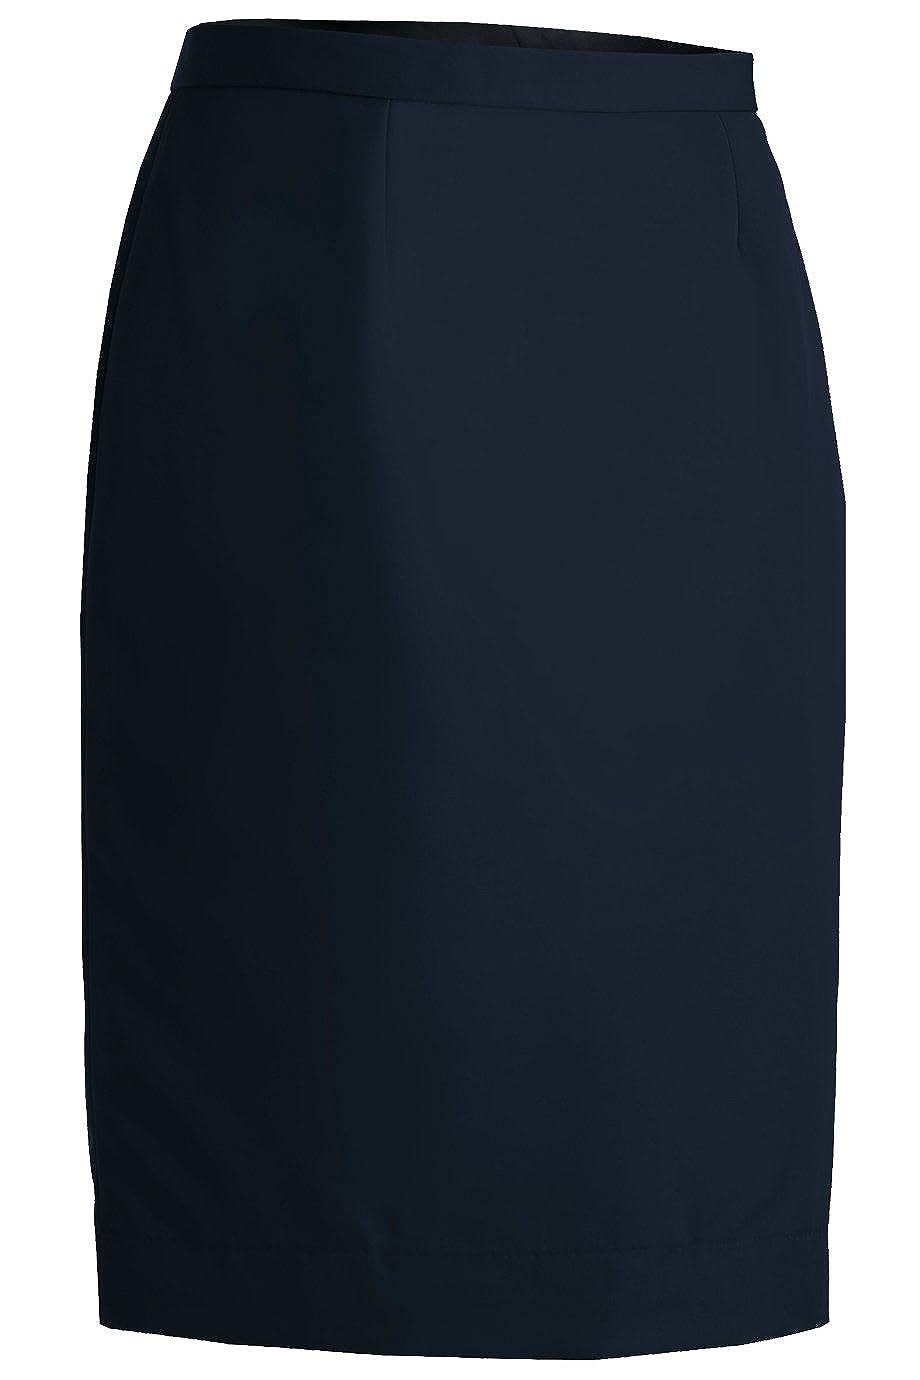 Edwards Garment Womens Polyester Straight Skirt 38.5W Dark Navy